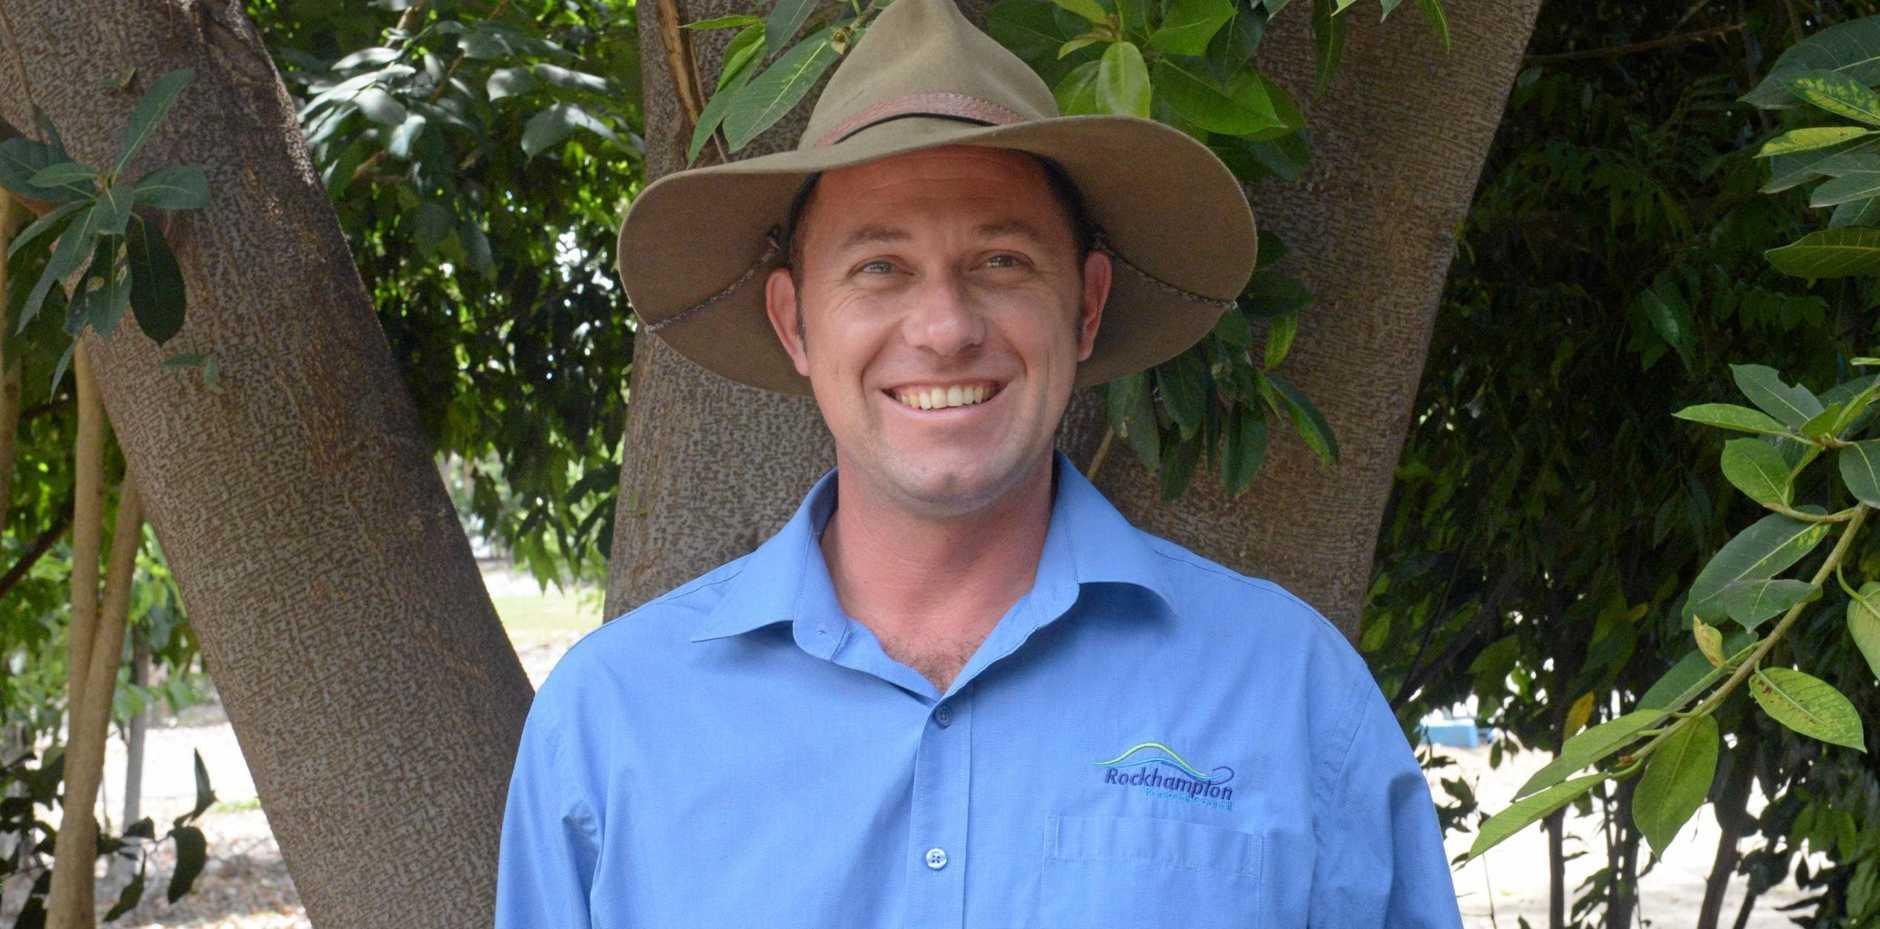 GREEN THUMB: Michael Elgey is the new curator at Rockhampton's Botanic and Kershaw Gardens